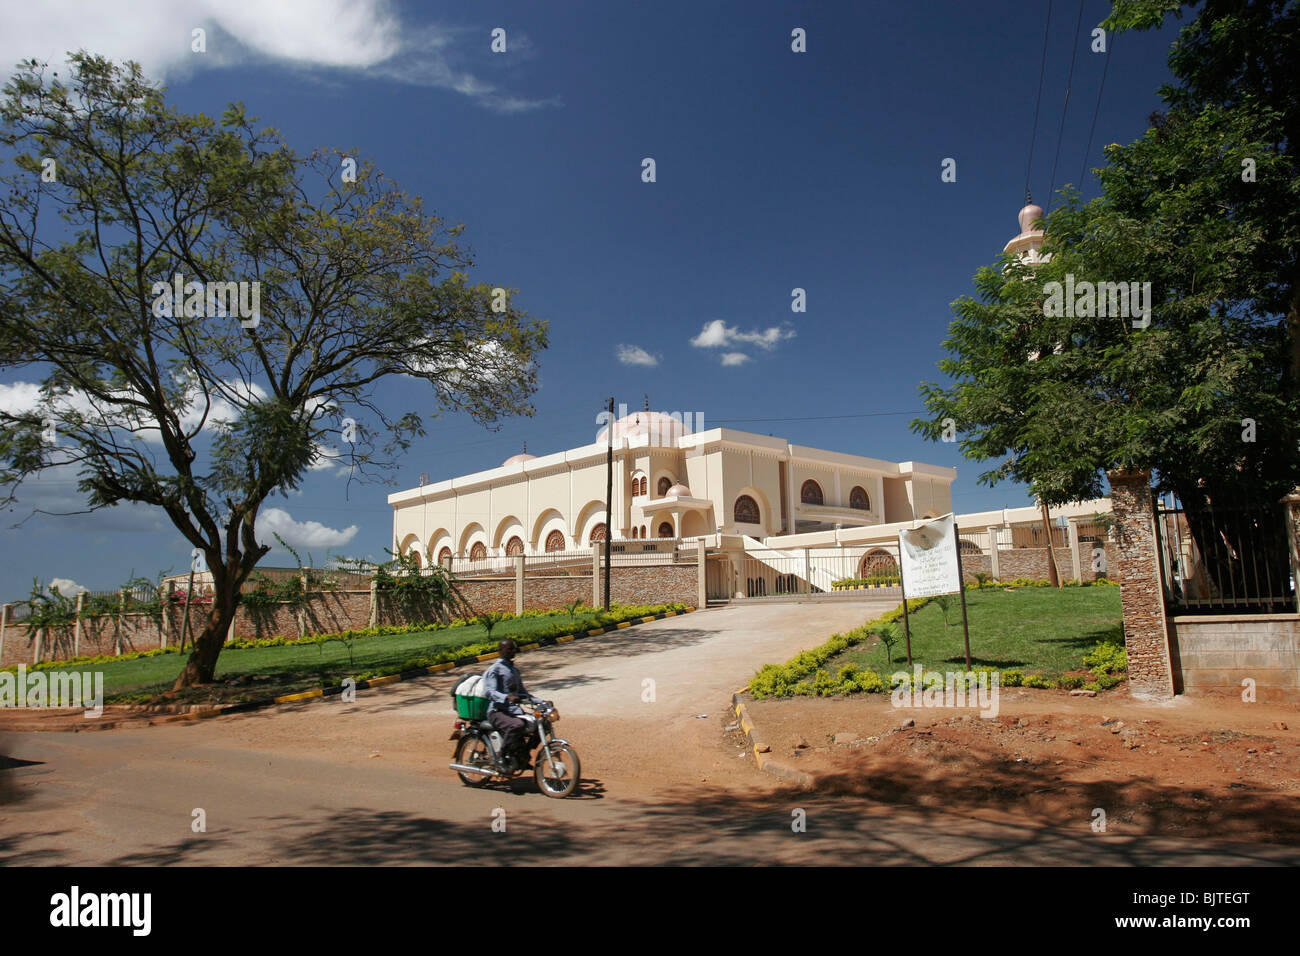 Motorcyclist drives past the colonel Gaddafi mosque. Kampala. Uganda. Africa - Stock Image